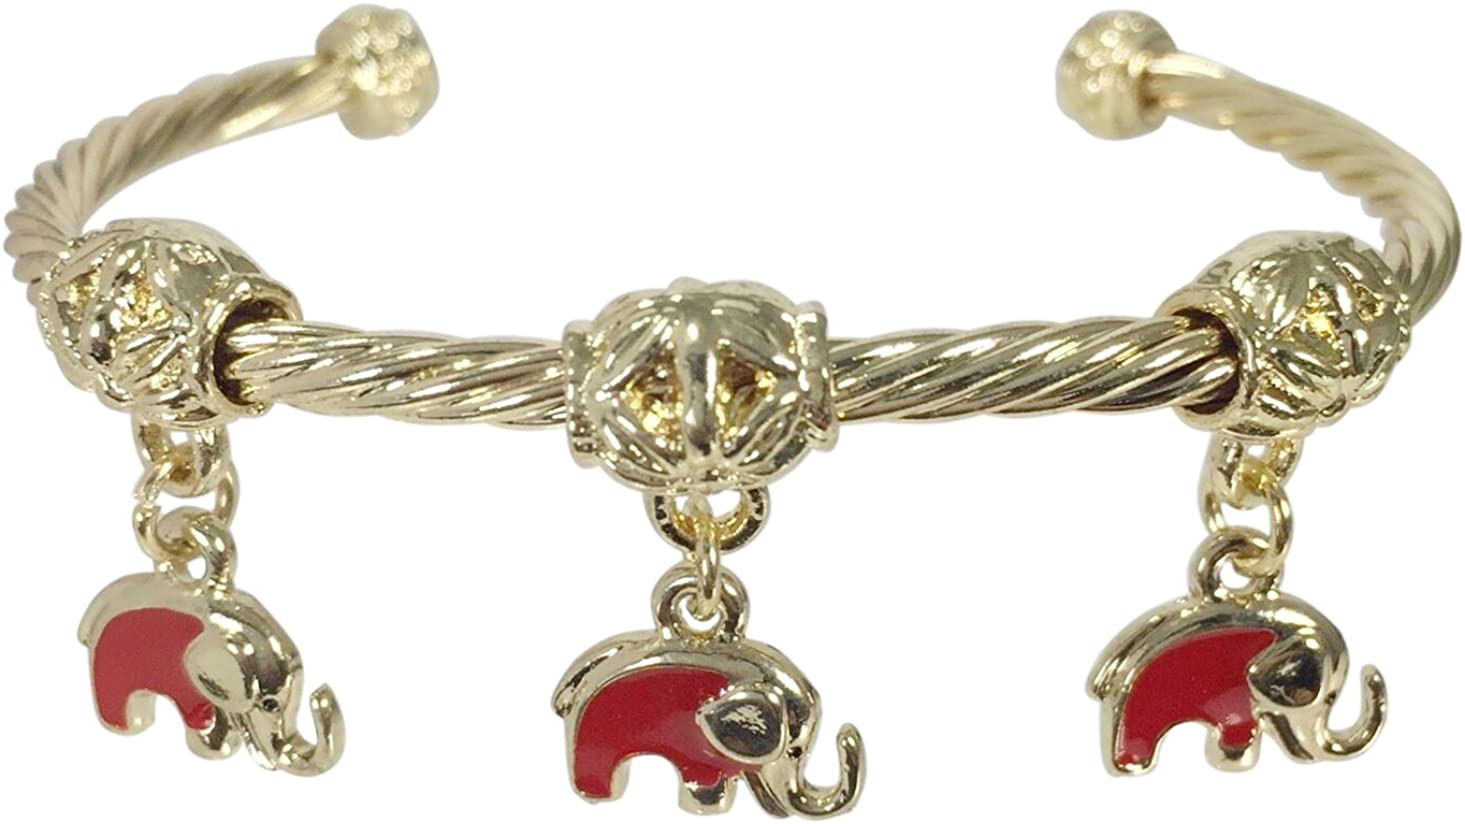 Gypsy Jewels Cute Dainty Dangle Elephant Charms Gold Tone Small Fit Cuff Bracelet